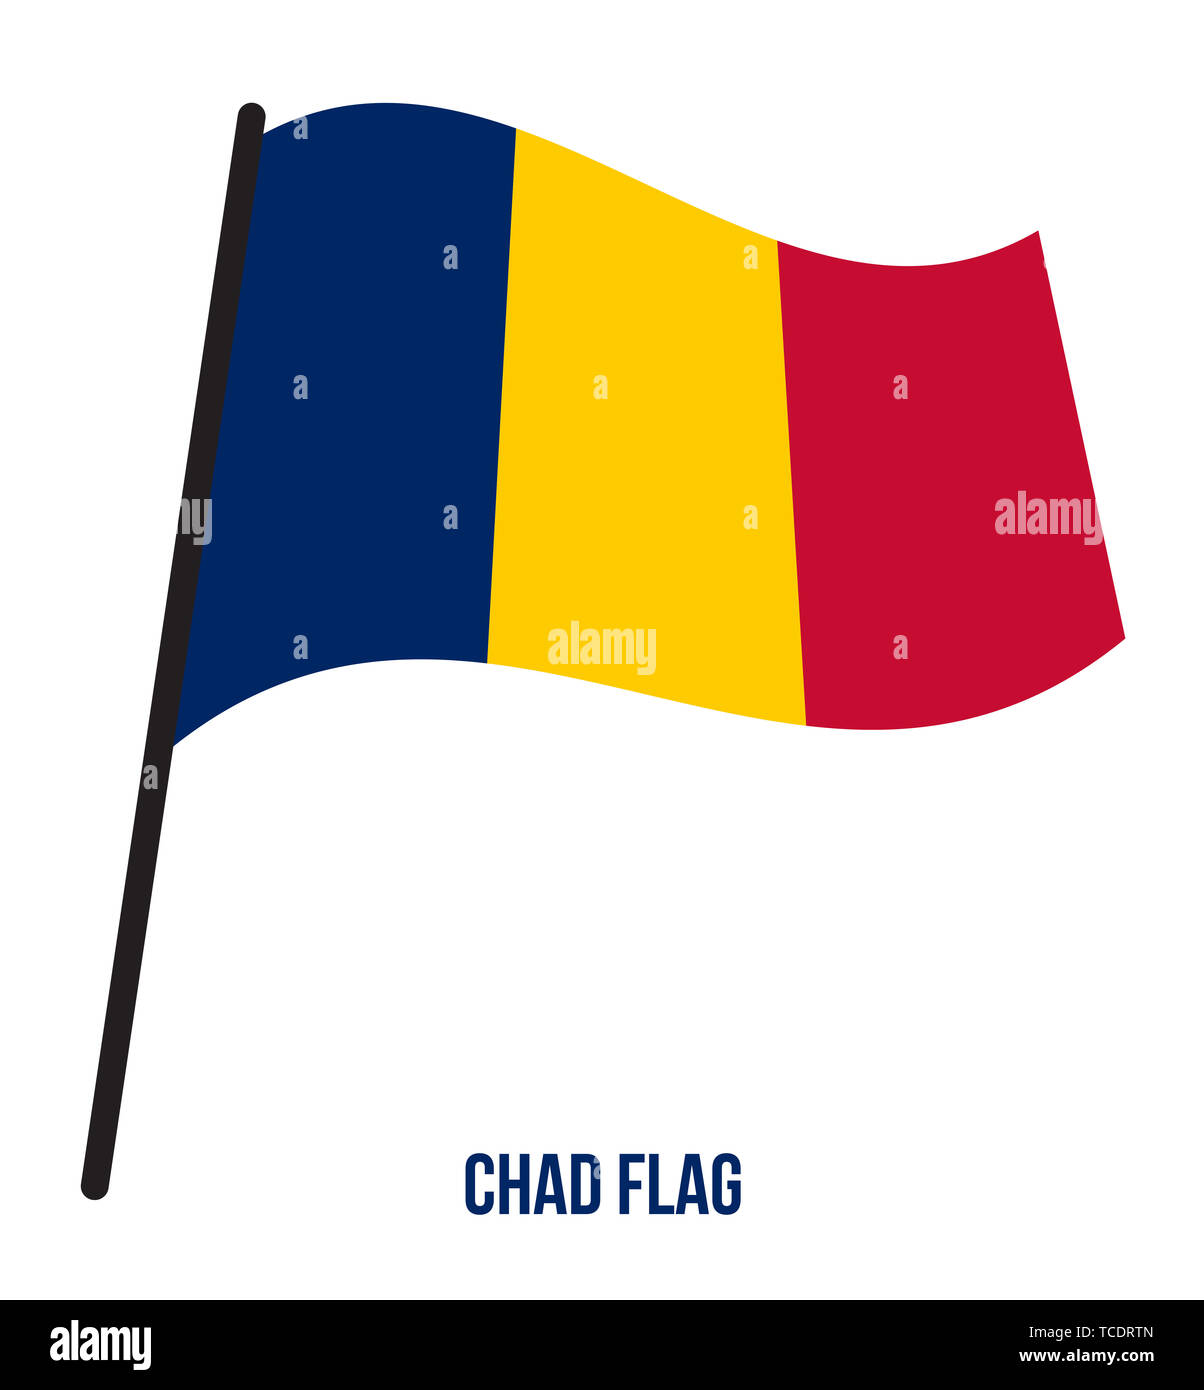 Chad Flag Waving Vector Illustration on White Background. Chad National Flag. - Stock Image